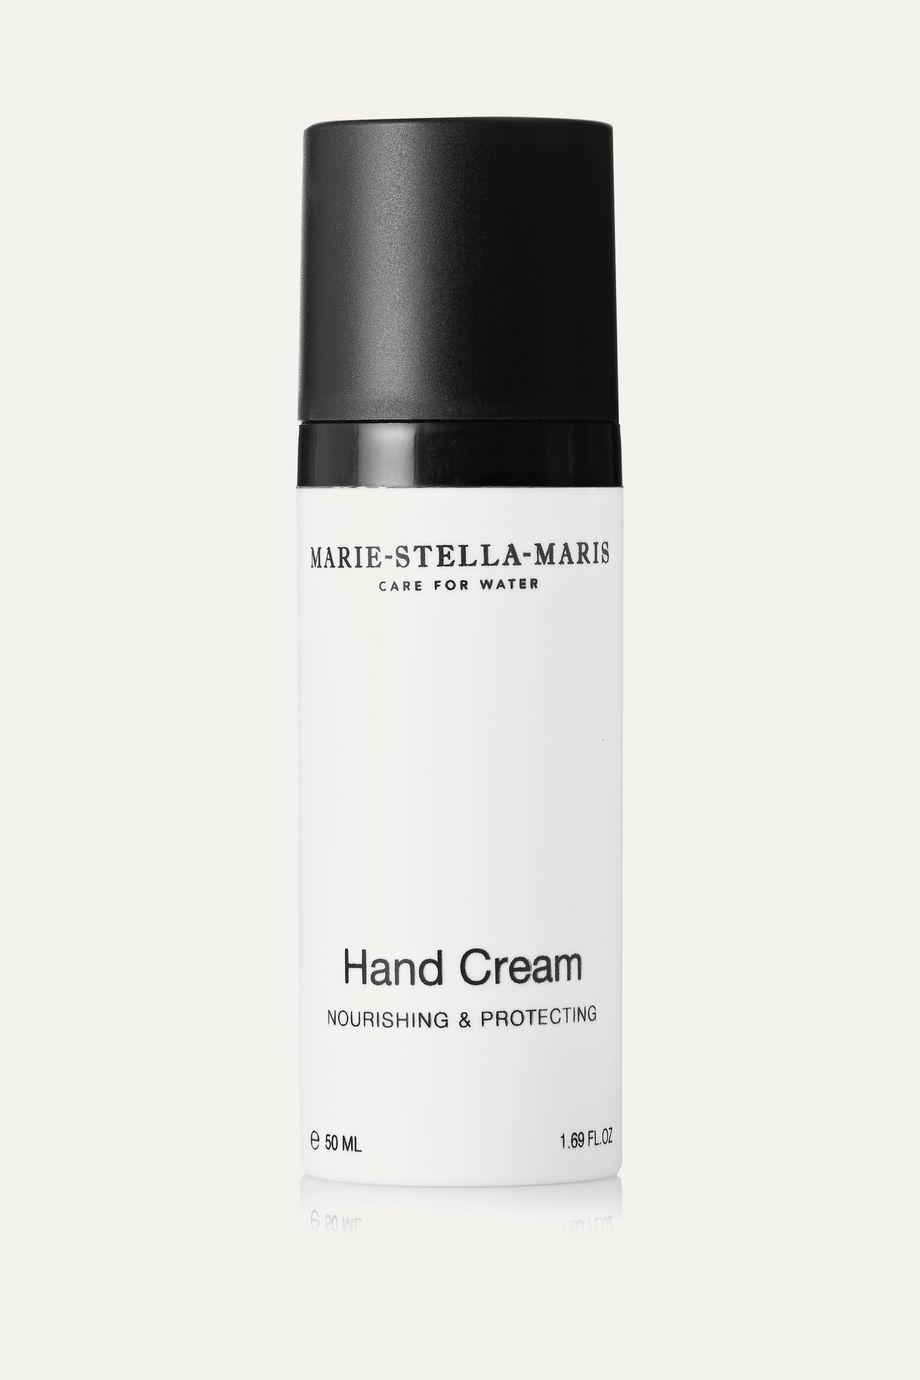 Marie-Stella-Maris Hand Cream, 50 ml – Handcreme